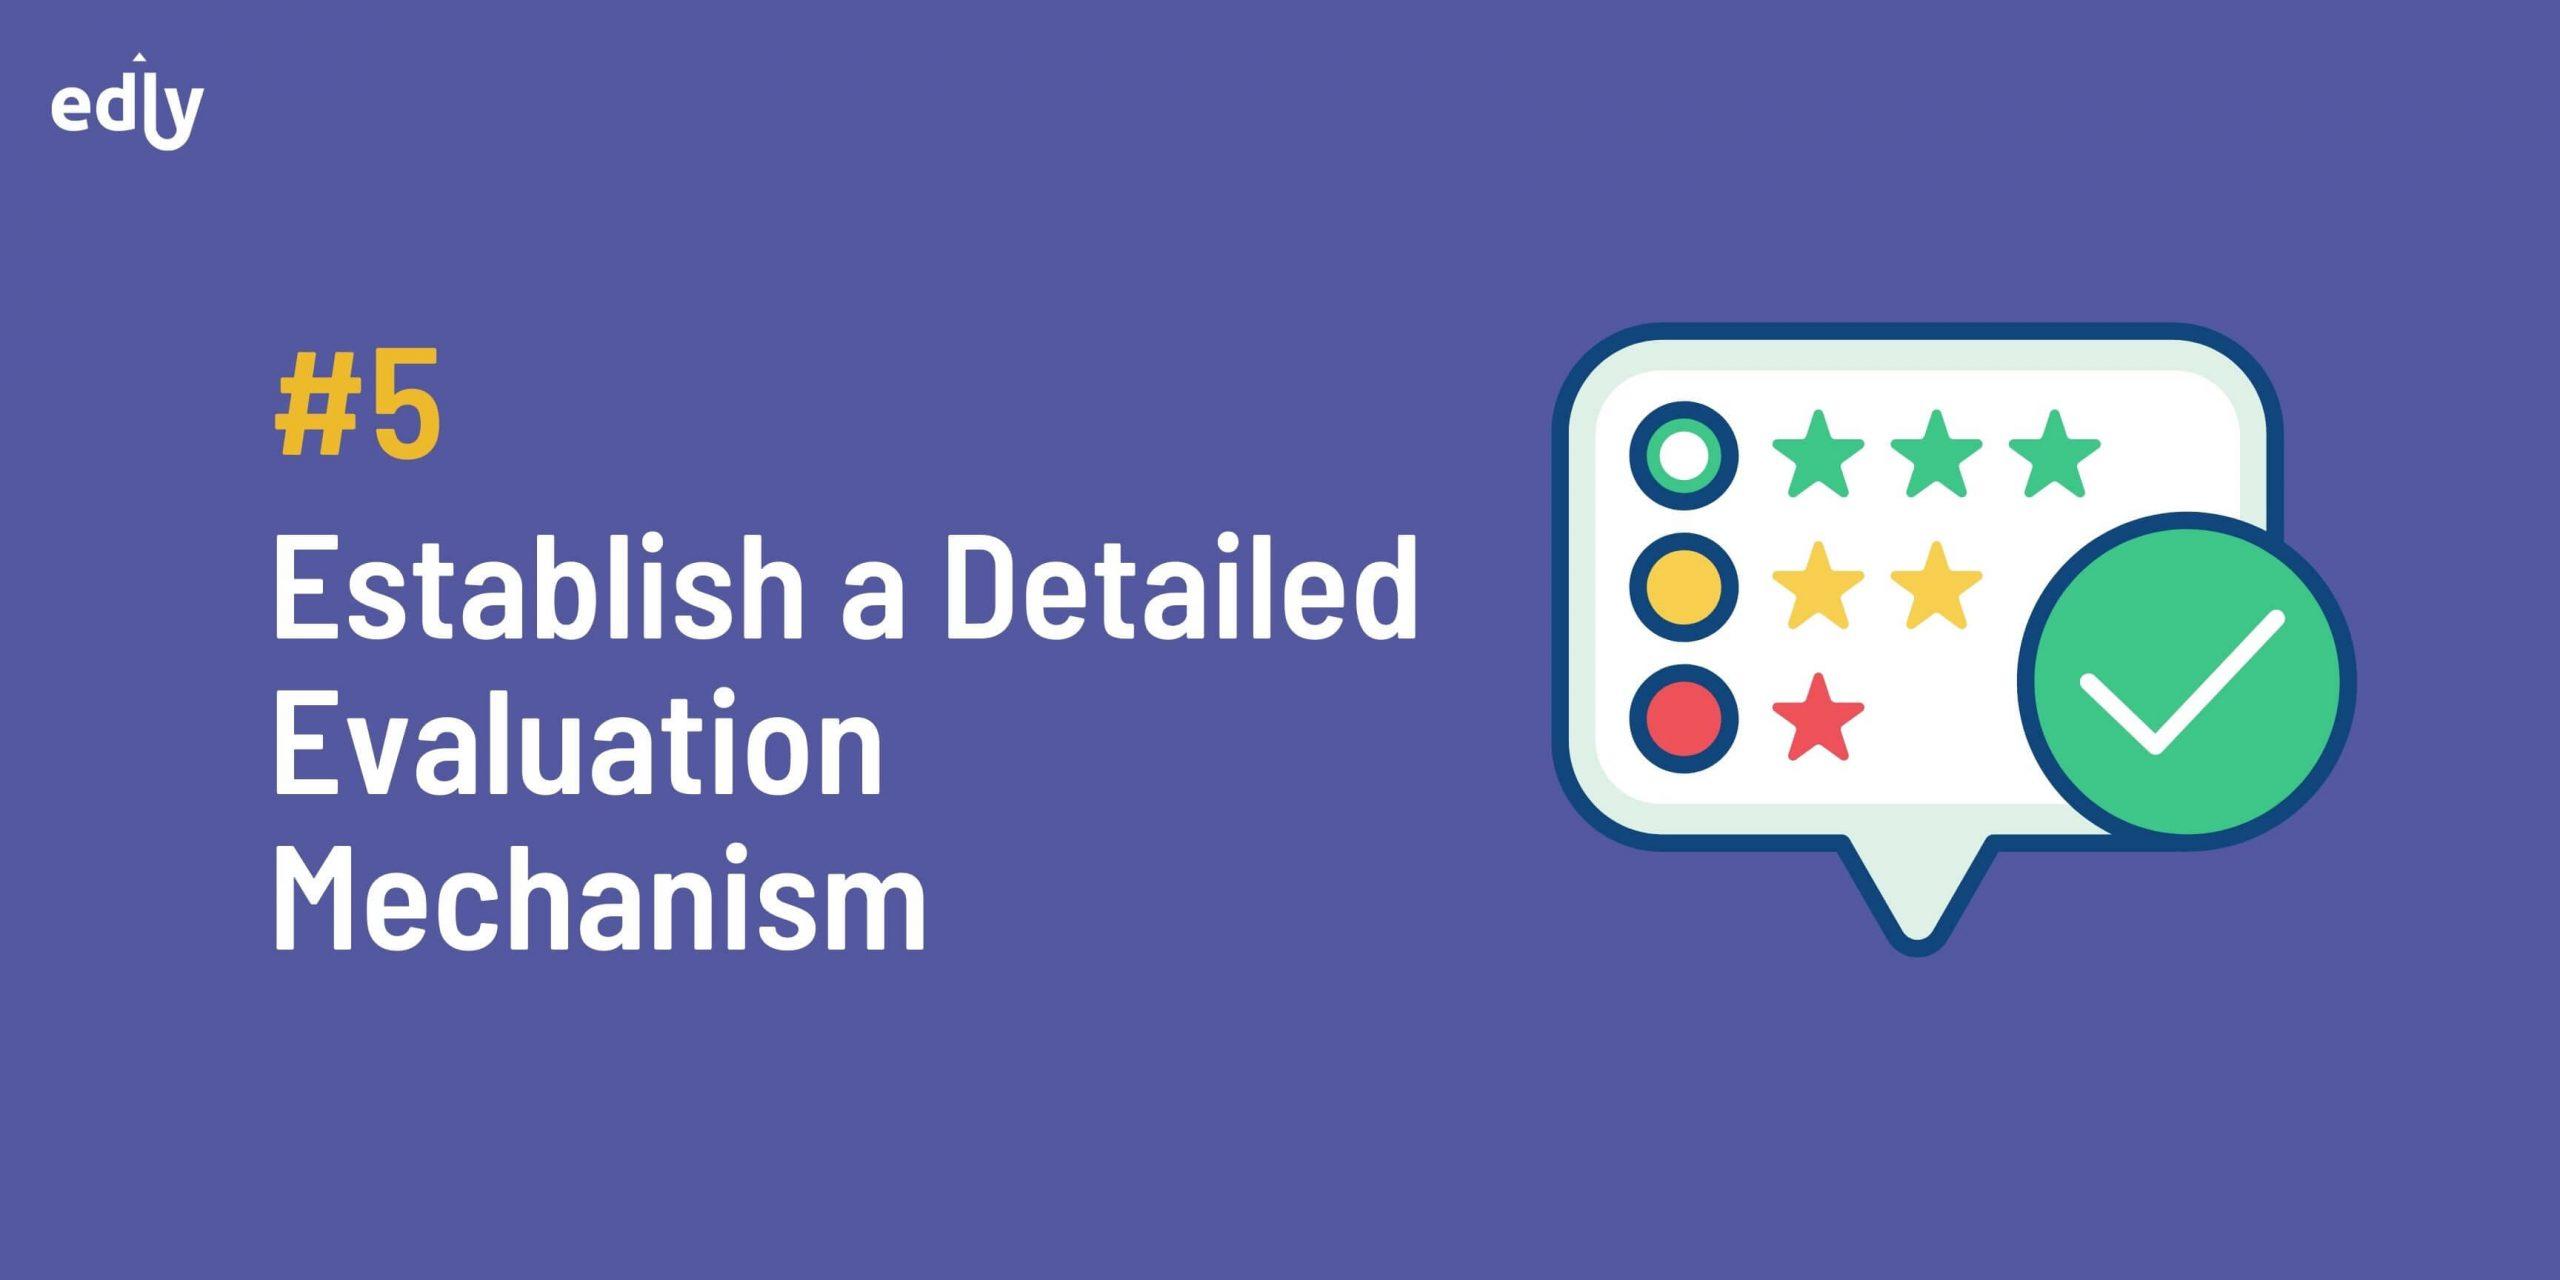 Establish a detailed evaluation mechanism